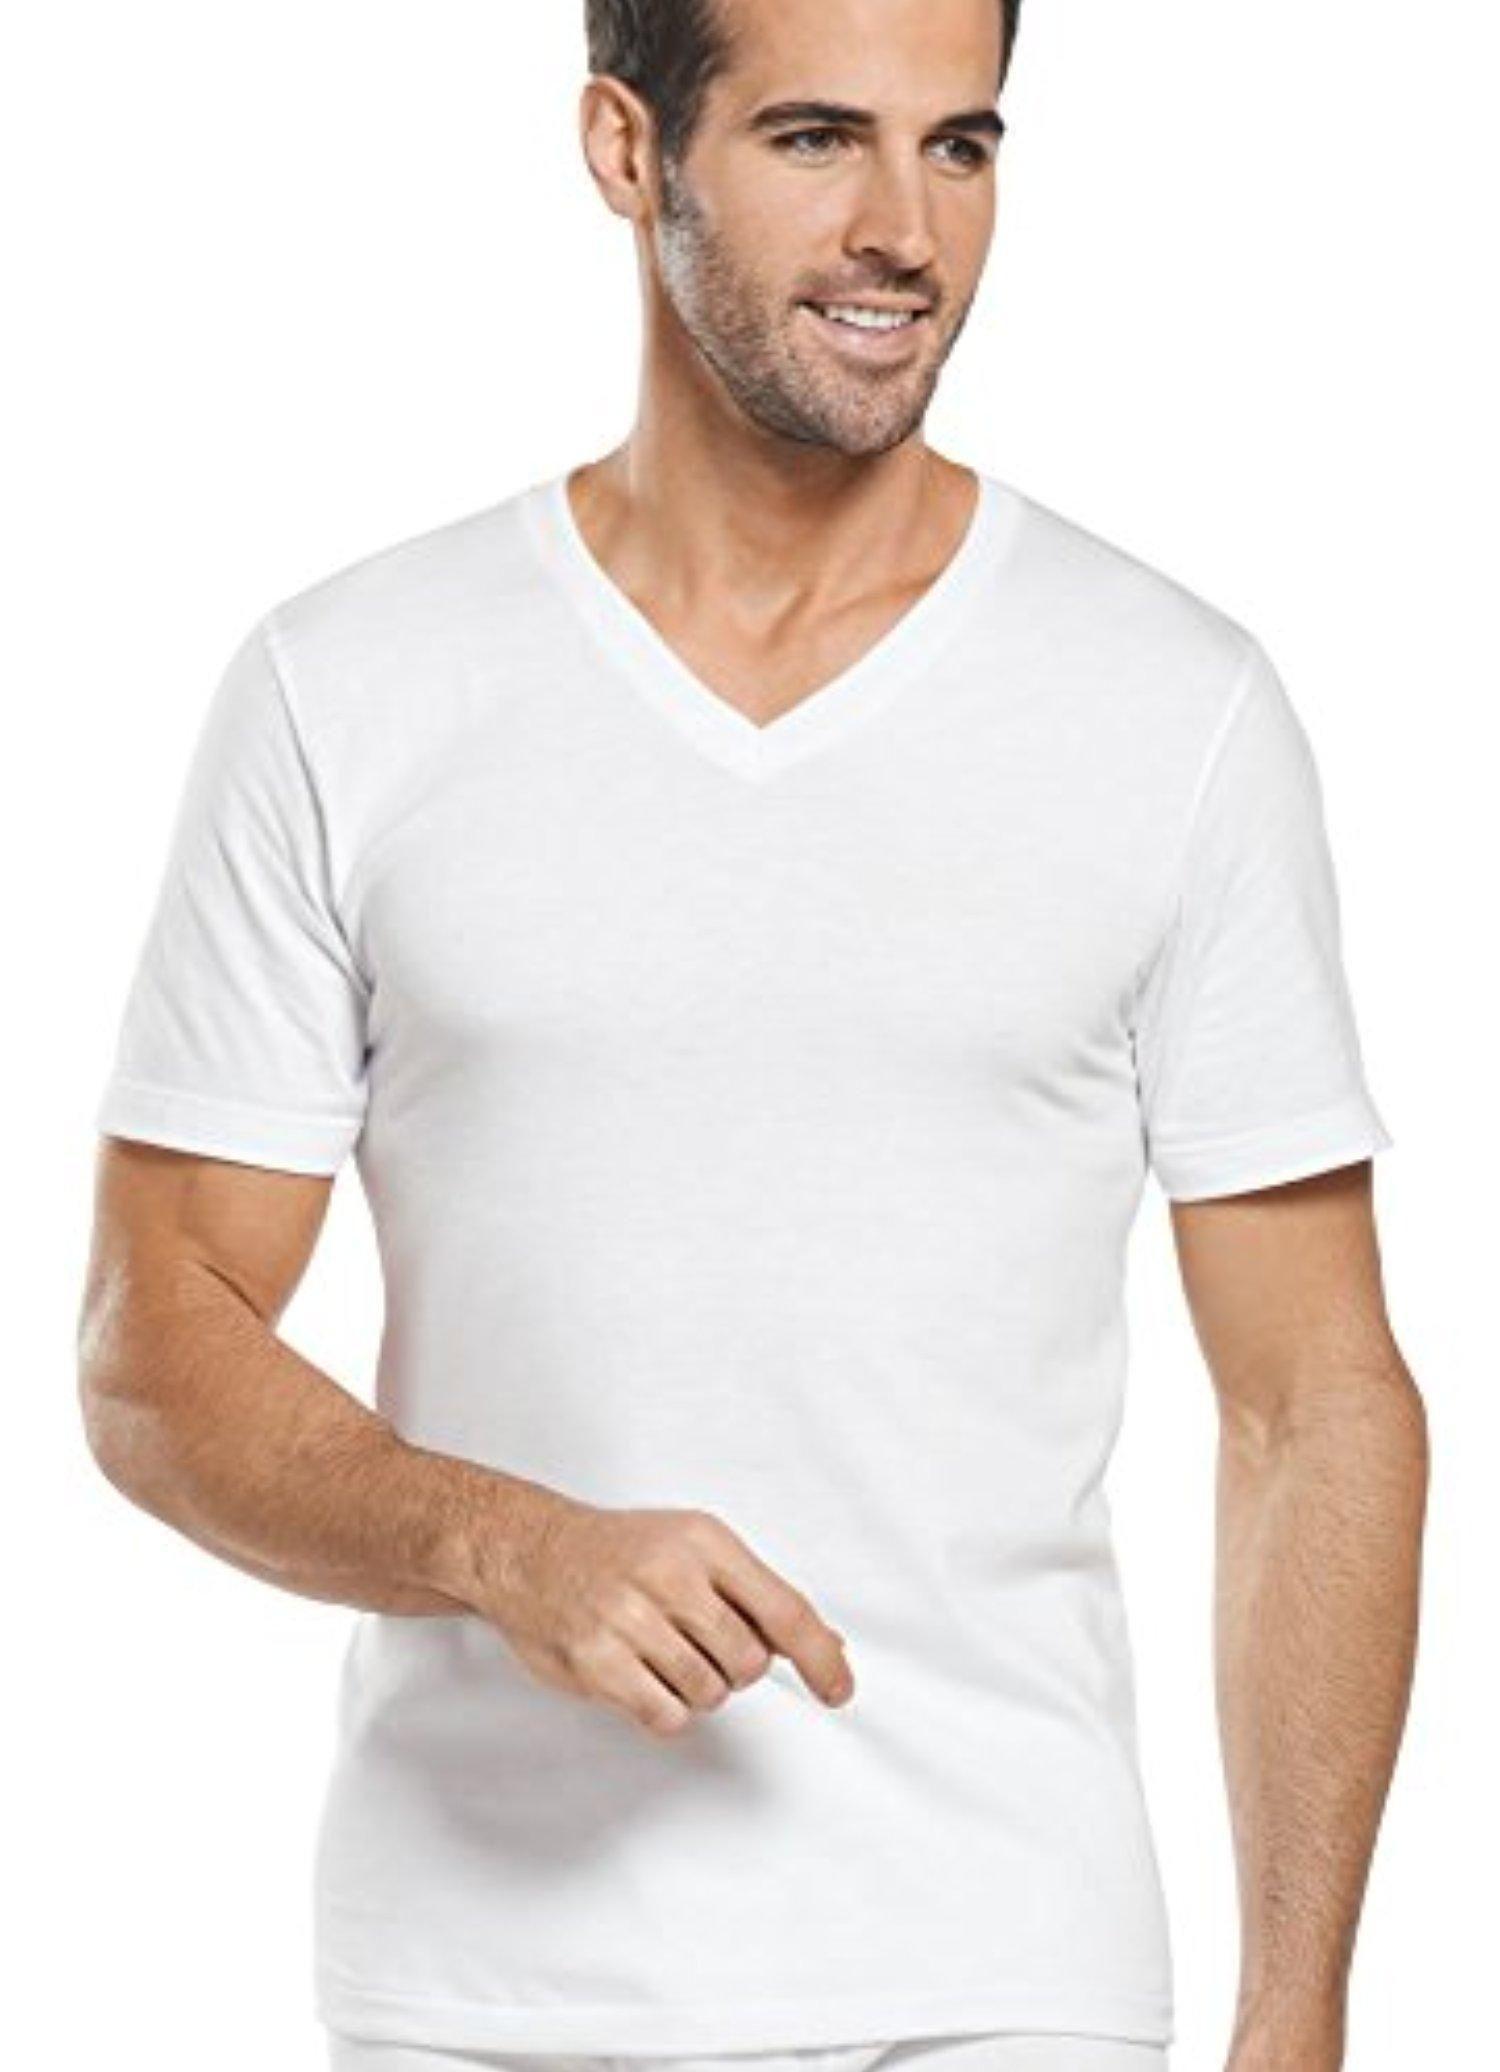 49b8638e Jockey Men's T-Shirts Big Man Classic V-Neck - 2 Pack, diamond white, 5XL -  Brought to you by Avarsha.com